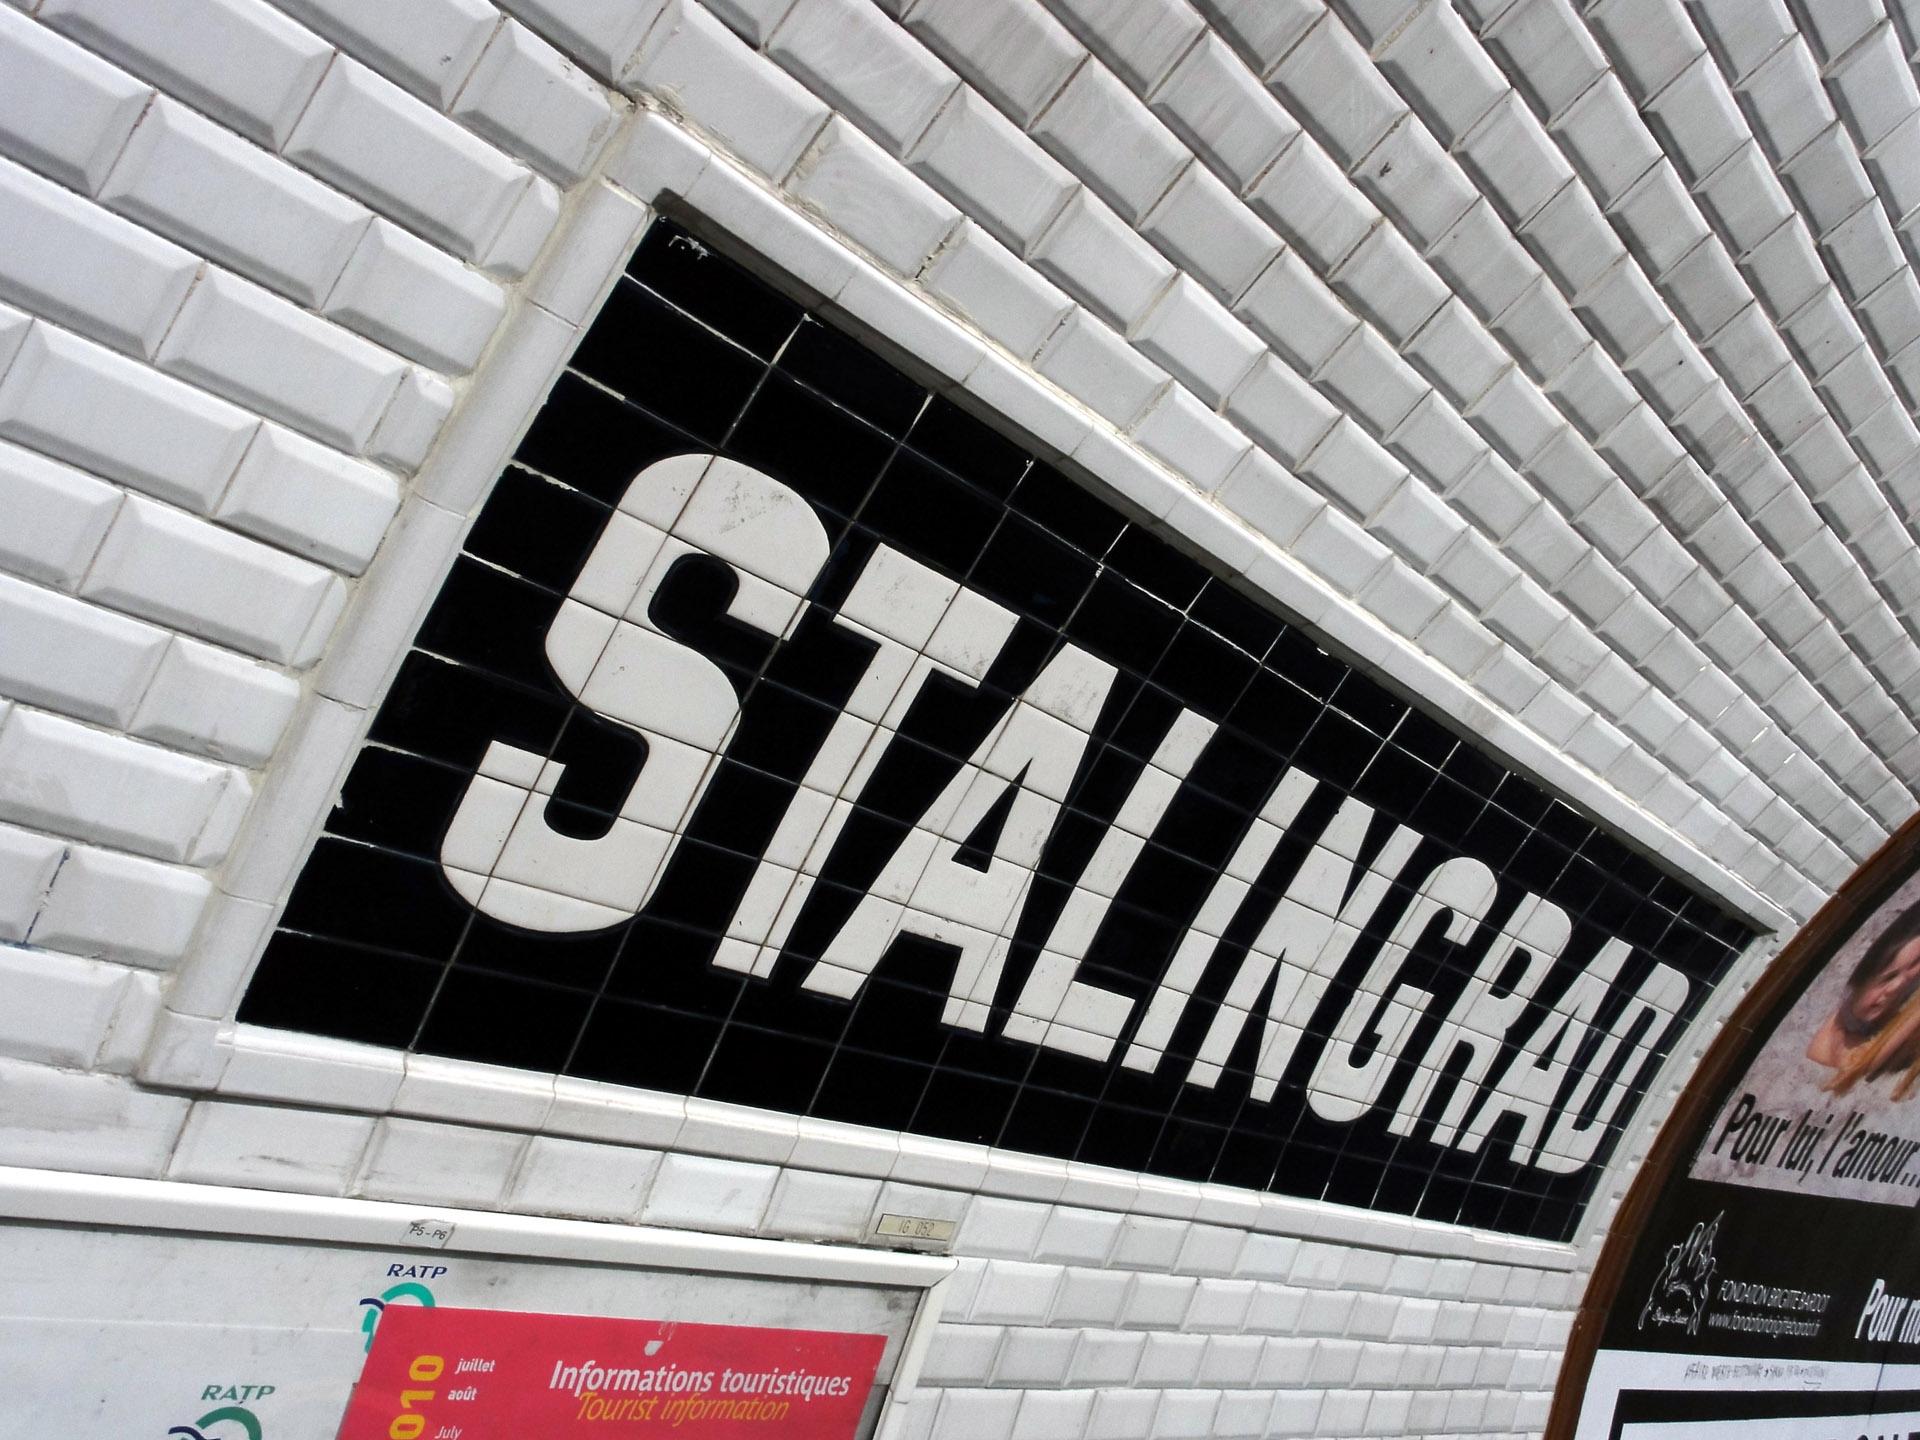 http://upload.wikimedia.org/wikipedia/commons/8/8f/Metro_de_Paris_-_Ligne_5_-_Stalingrad_03.jpg